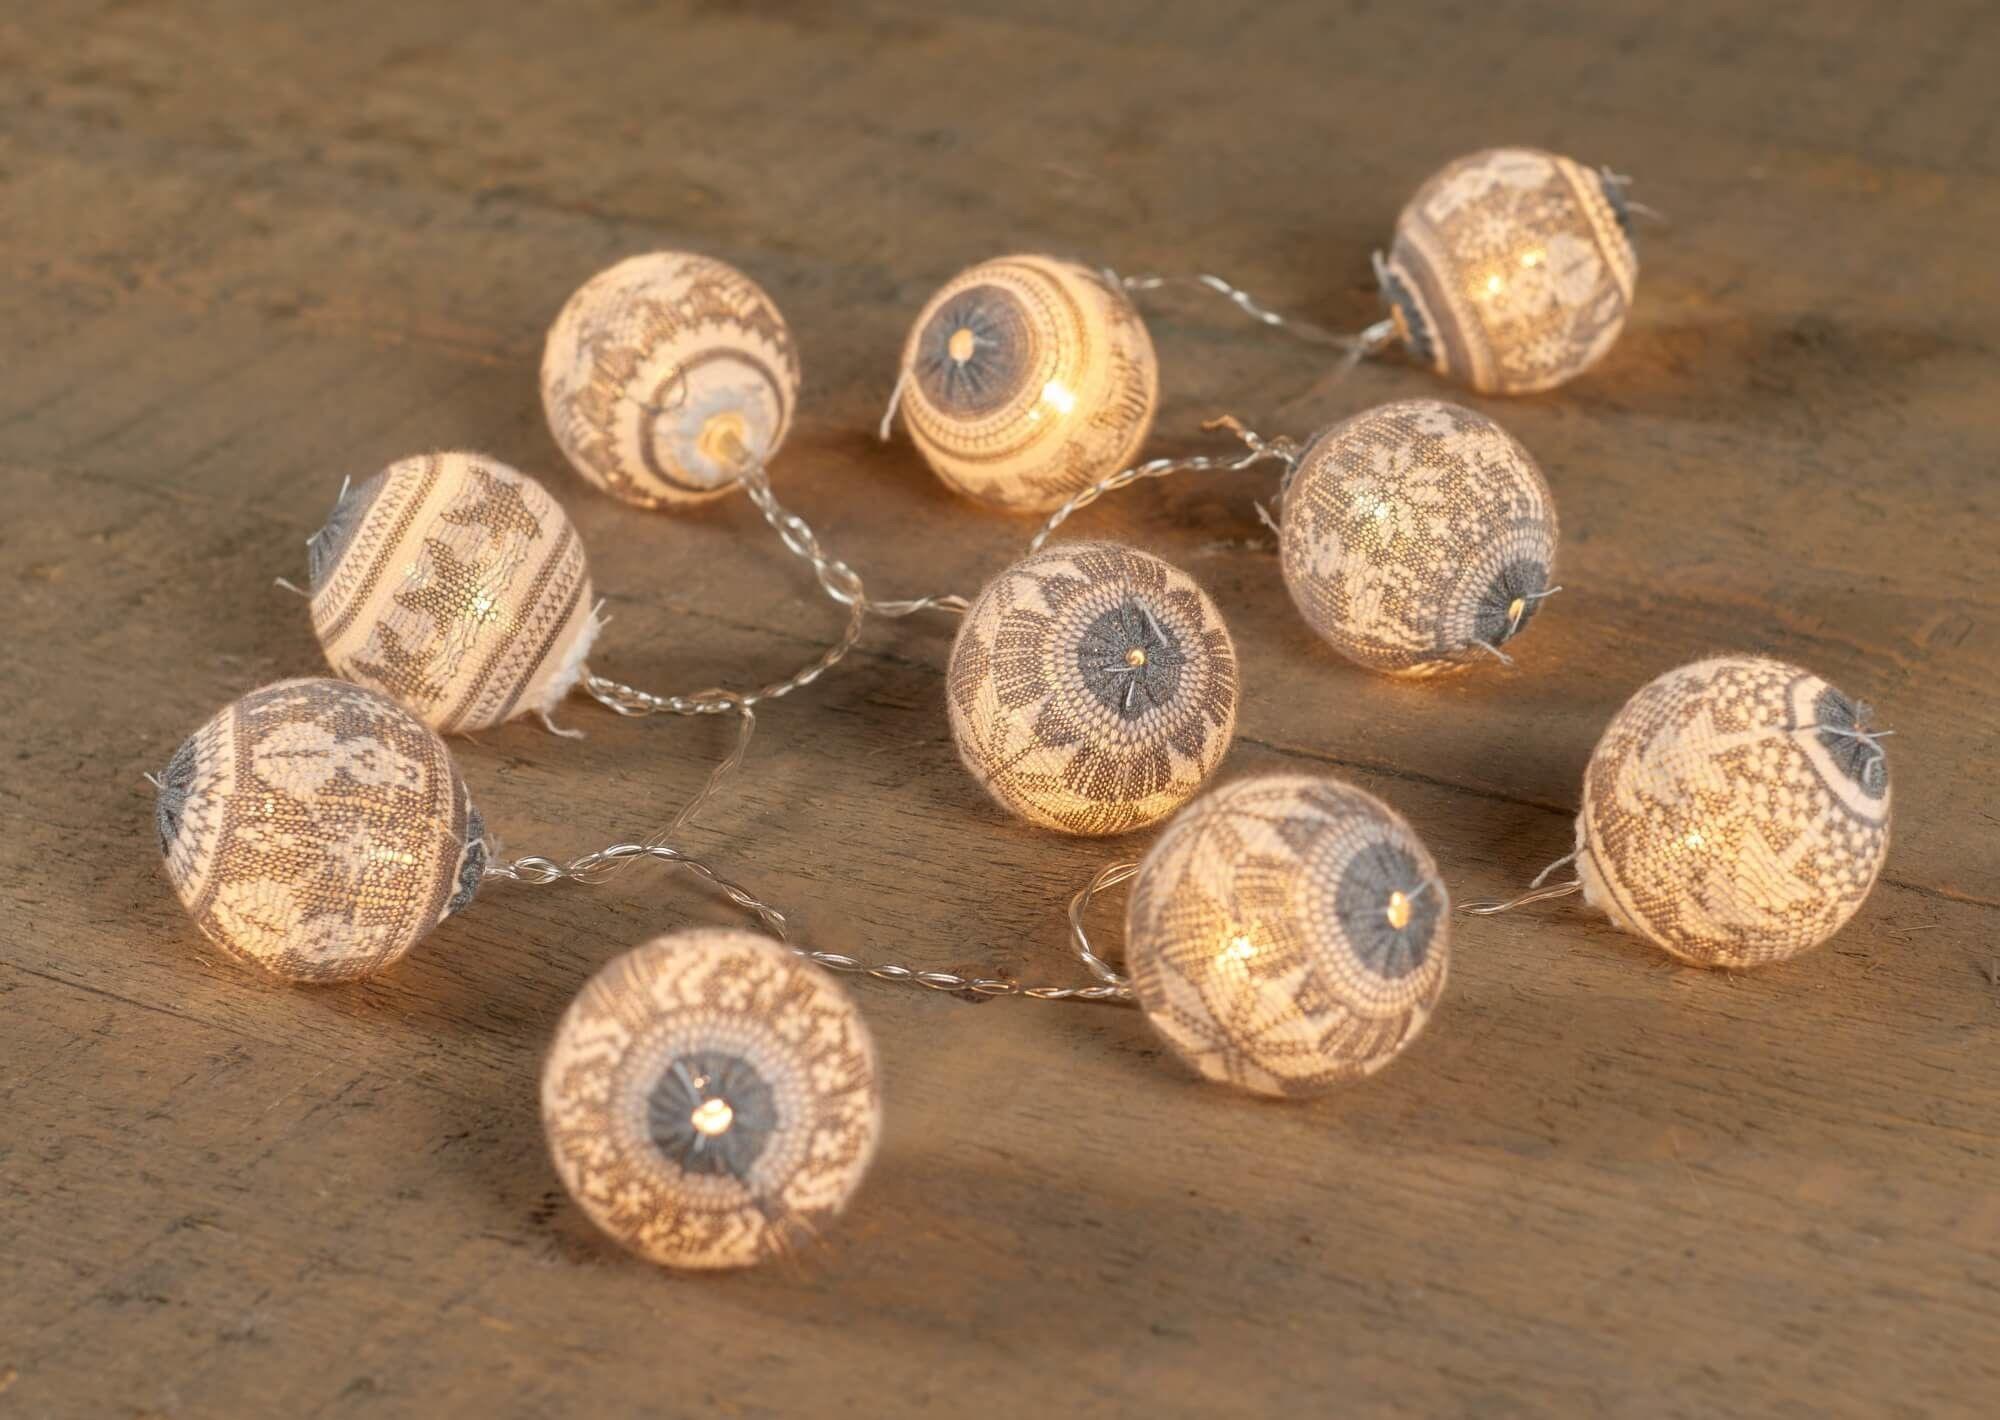 Świecące lampiony kule LED